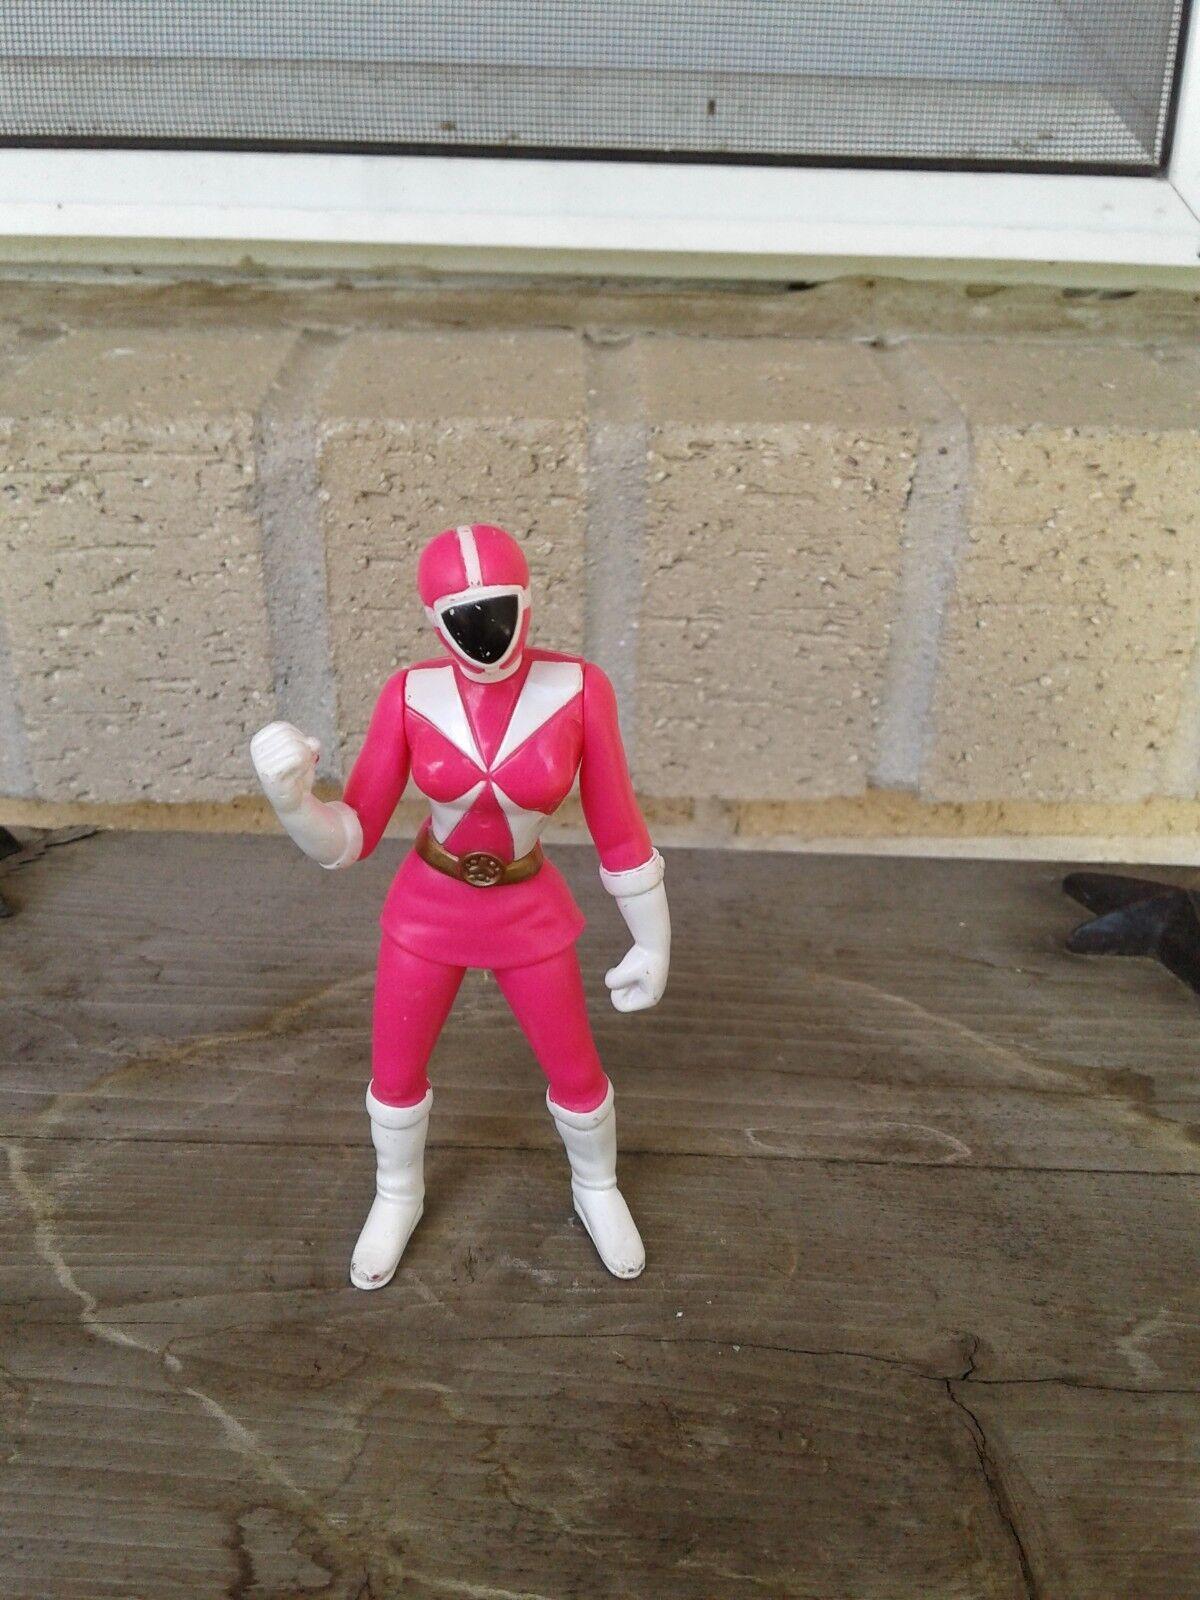 Pink Saban Power Ranger 2000 McDonald's Happy Meal Toy